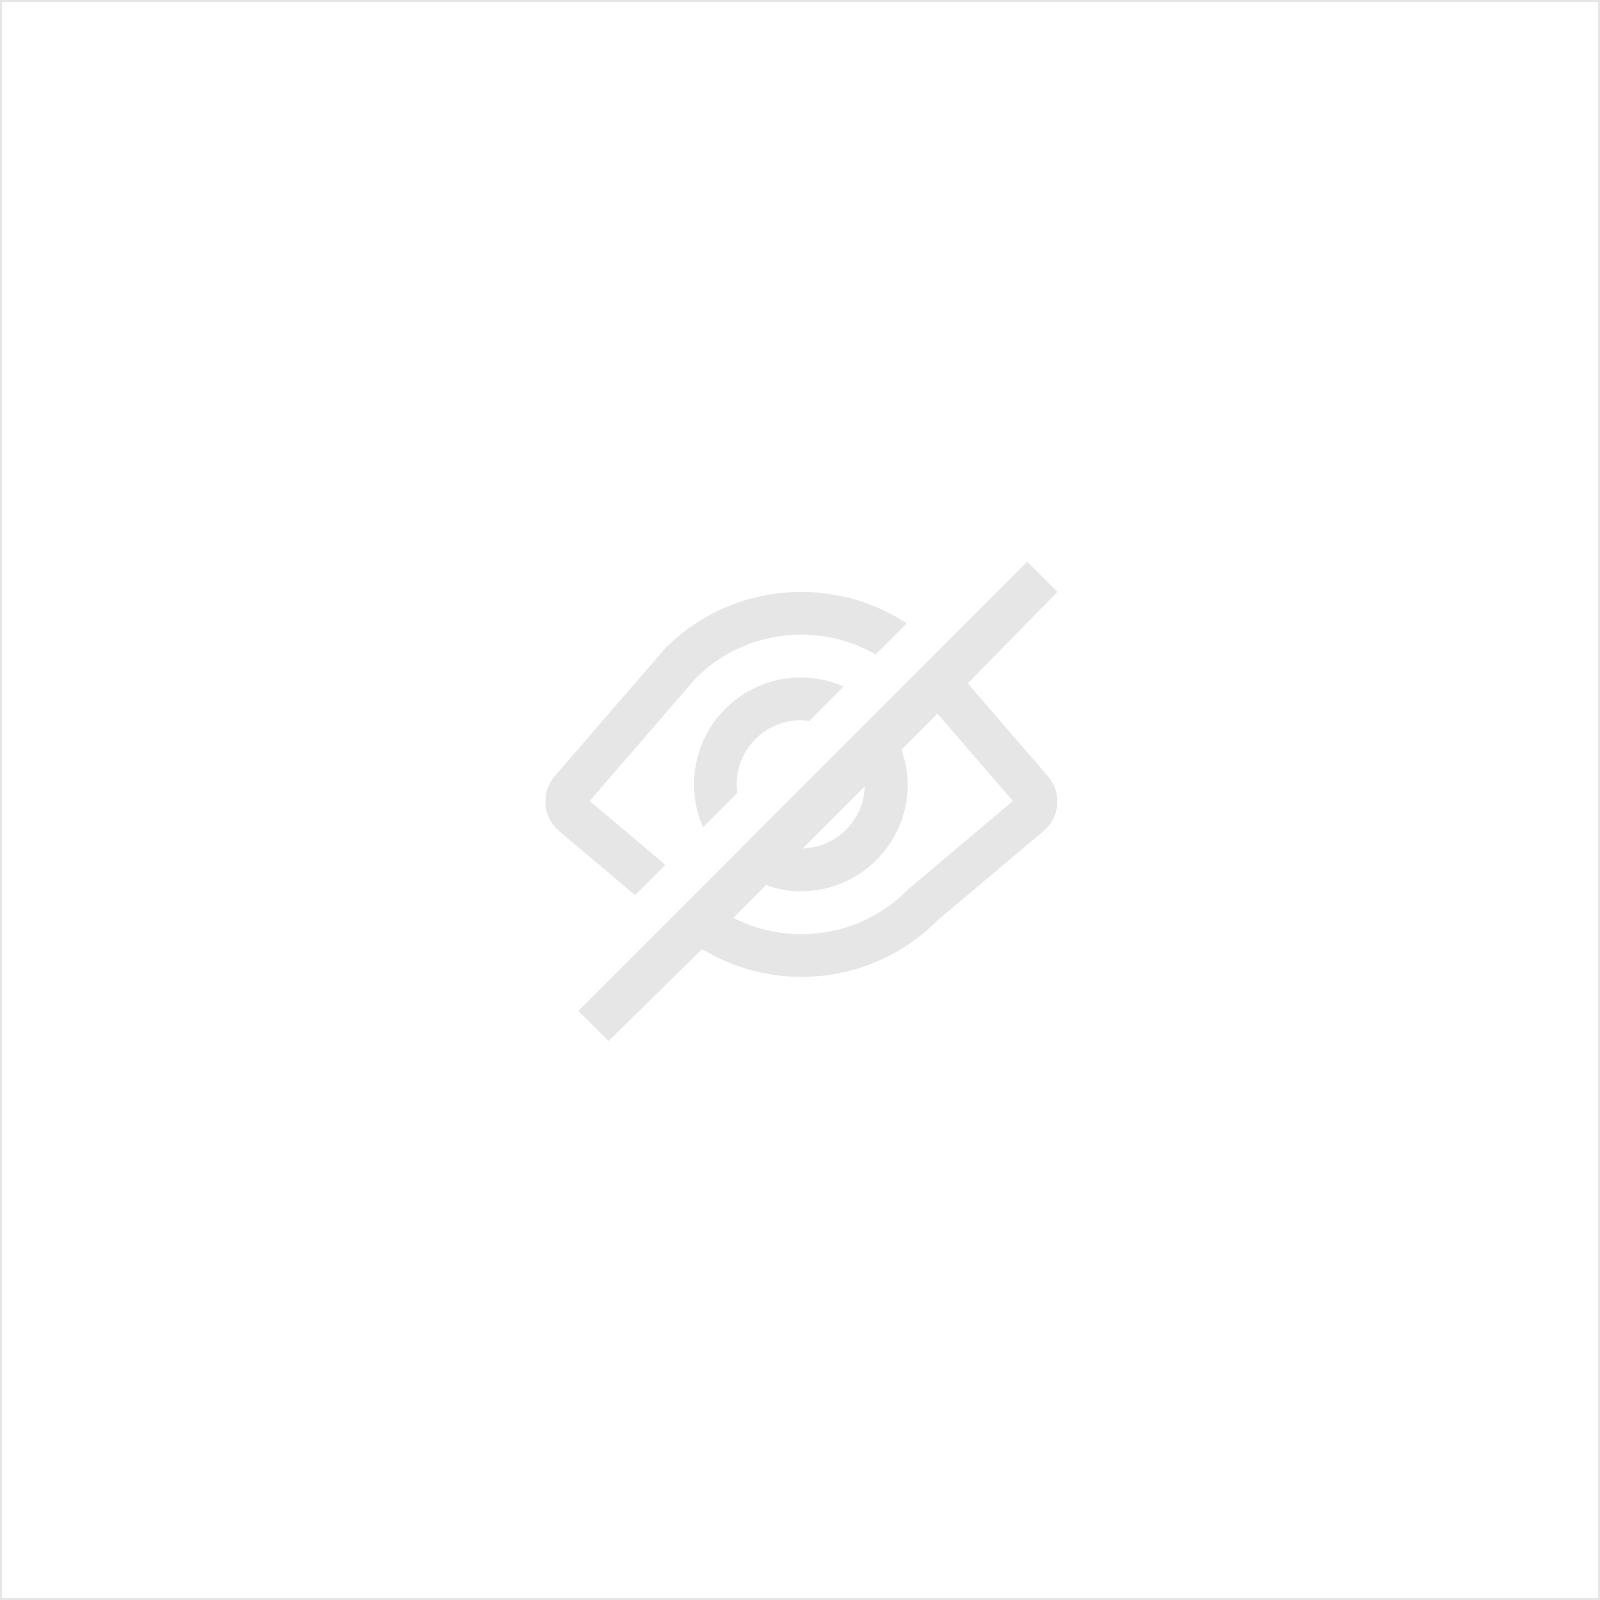 MEGUIAR'S NEXT GENERATION ALL METAL POLISH (G13005)